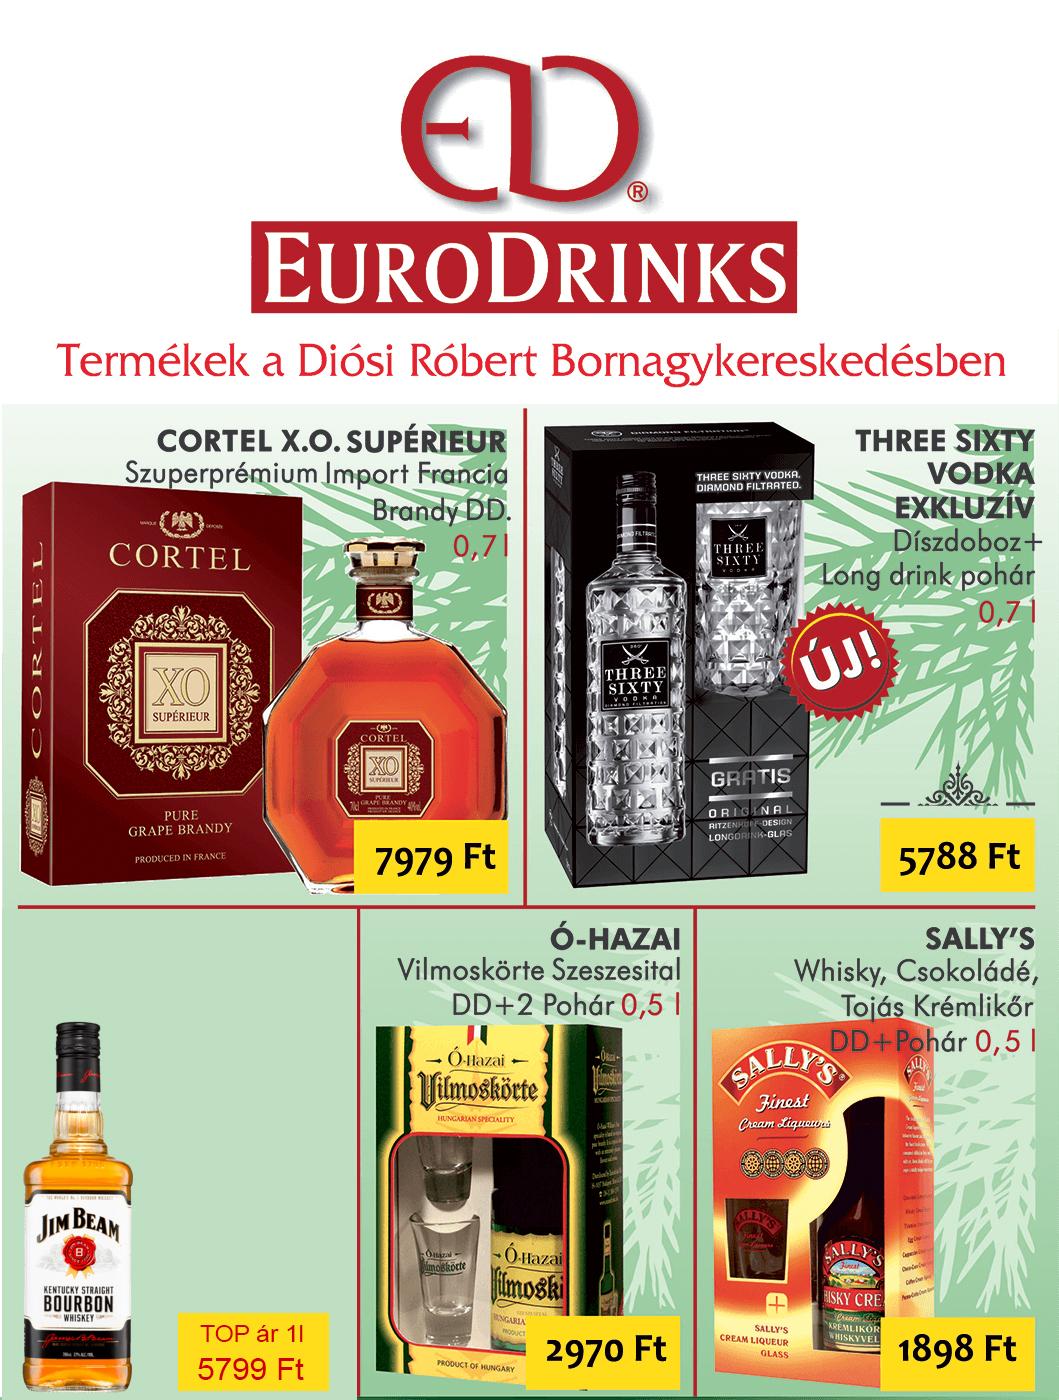 EU drinks